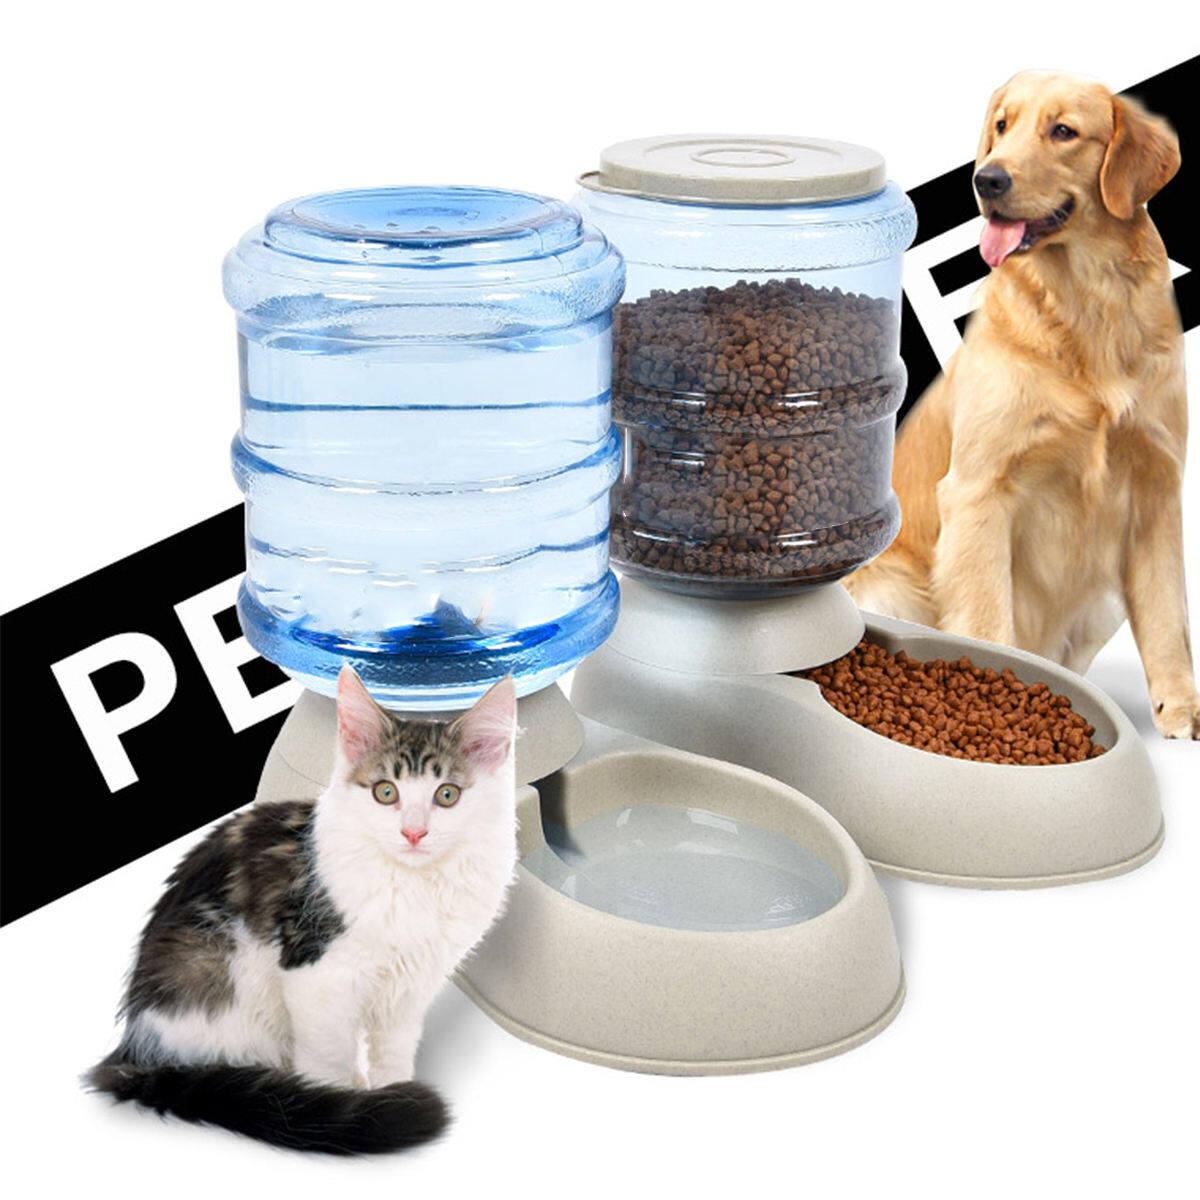 3 5l Pet Cat Dog Auto Water Drinker Food Feeder Dispenser Bekas Makanan Pets Animal Self Feeding Kucing Anjing Lazada